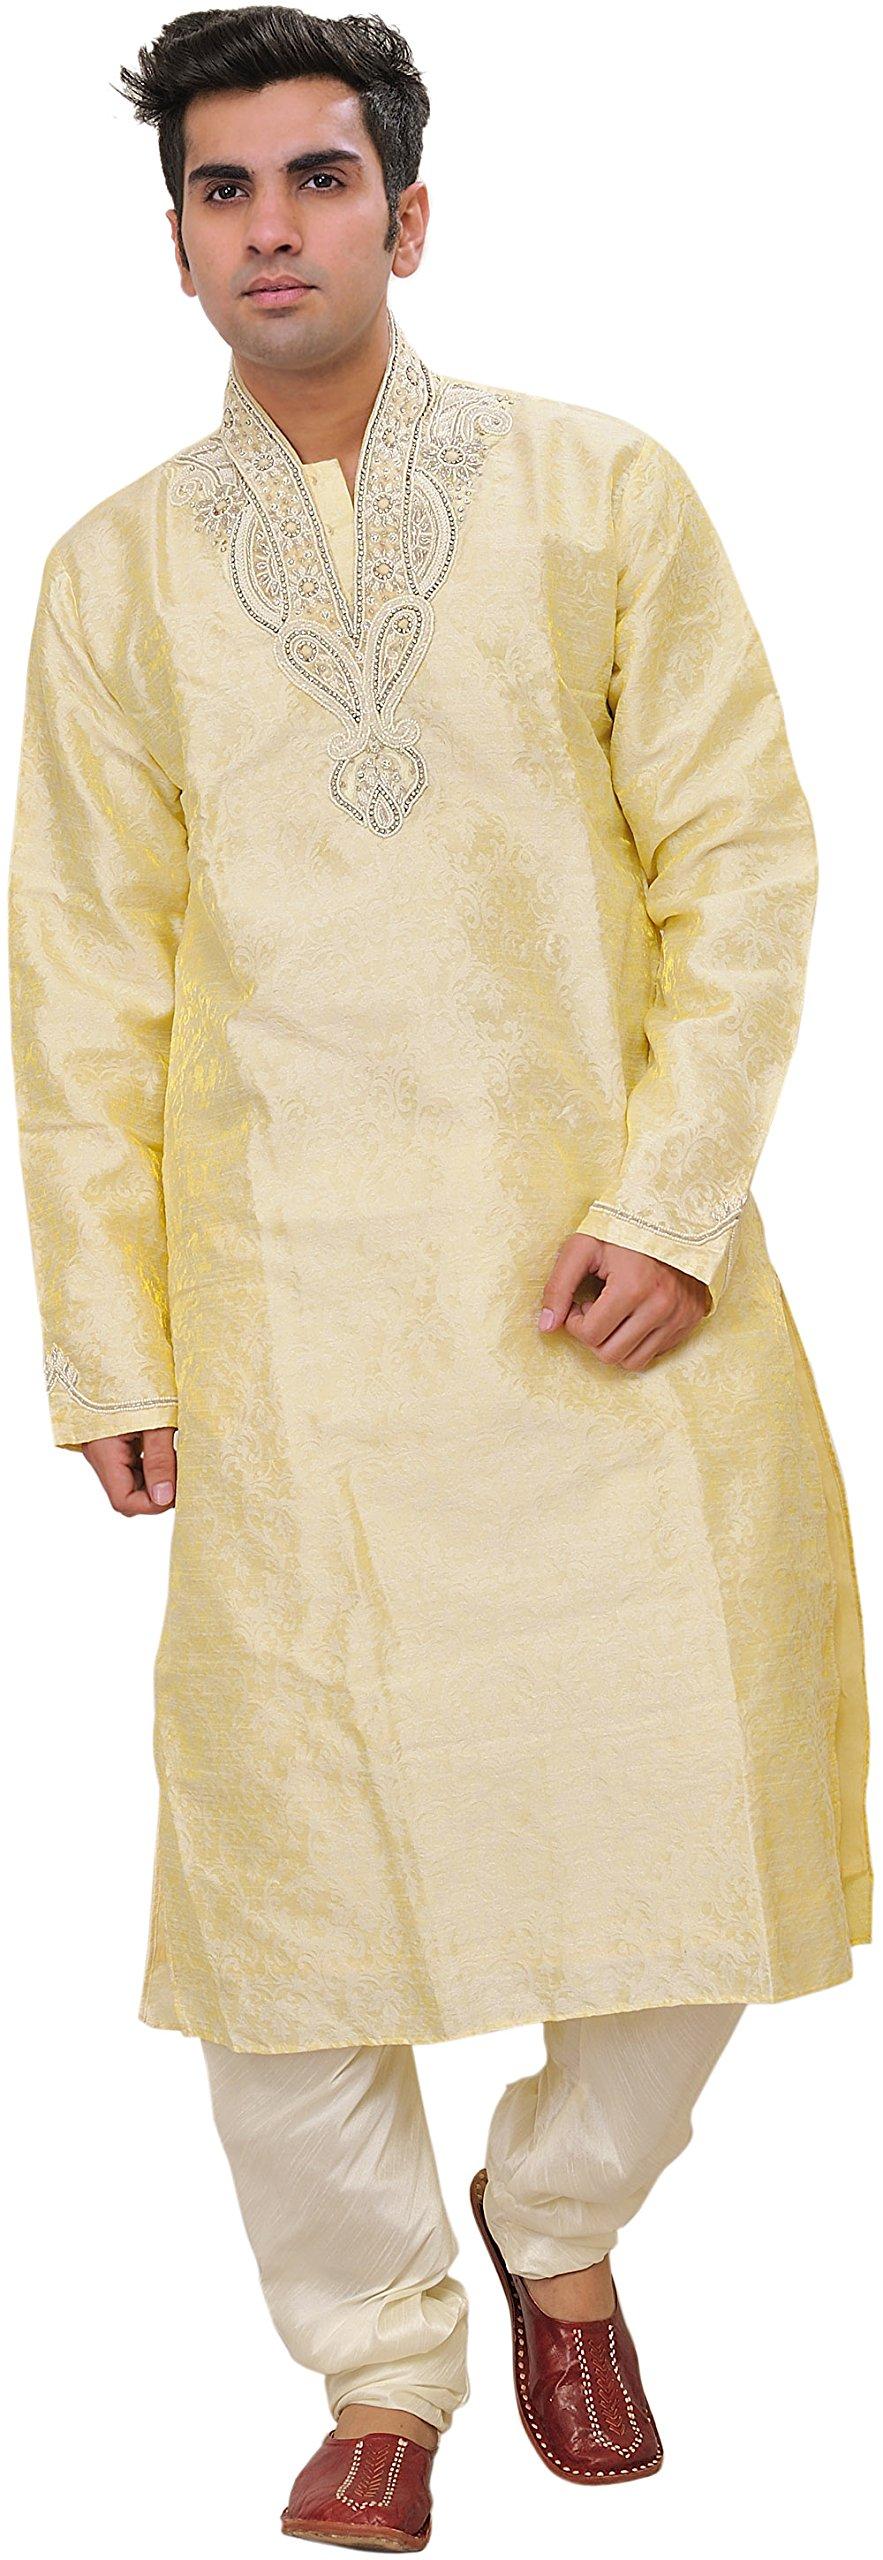 Exotic India Pastel-Yellow Wedding Kurta PA - Off-White Size 40